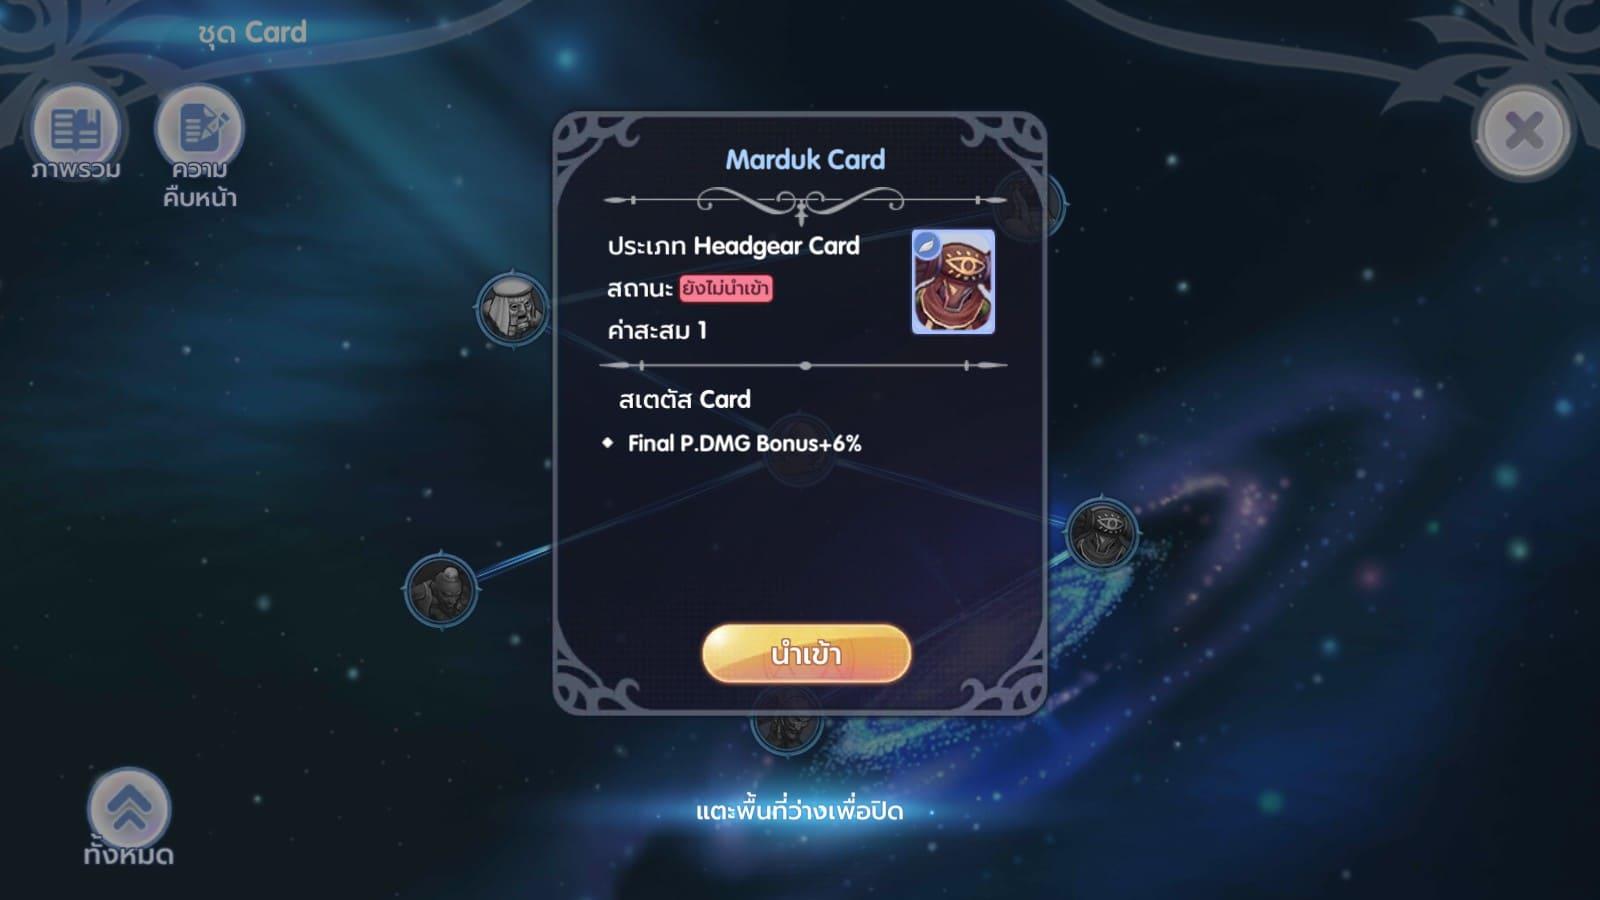 ROX - Marduk Card การ์ดสายกายภาพ